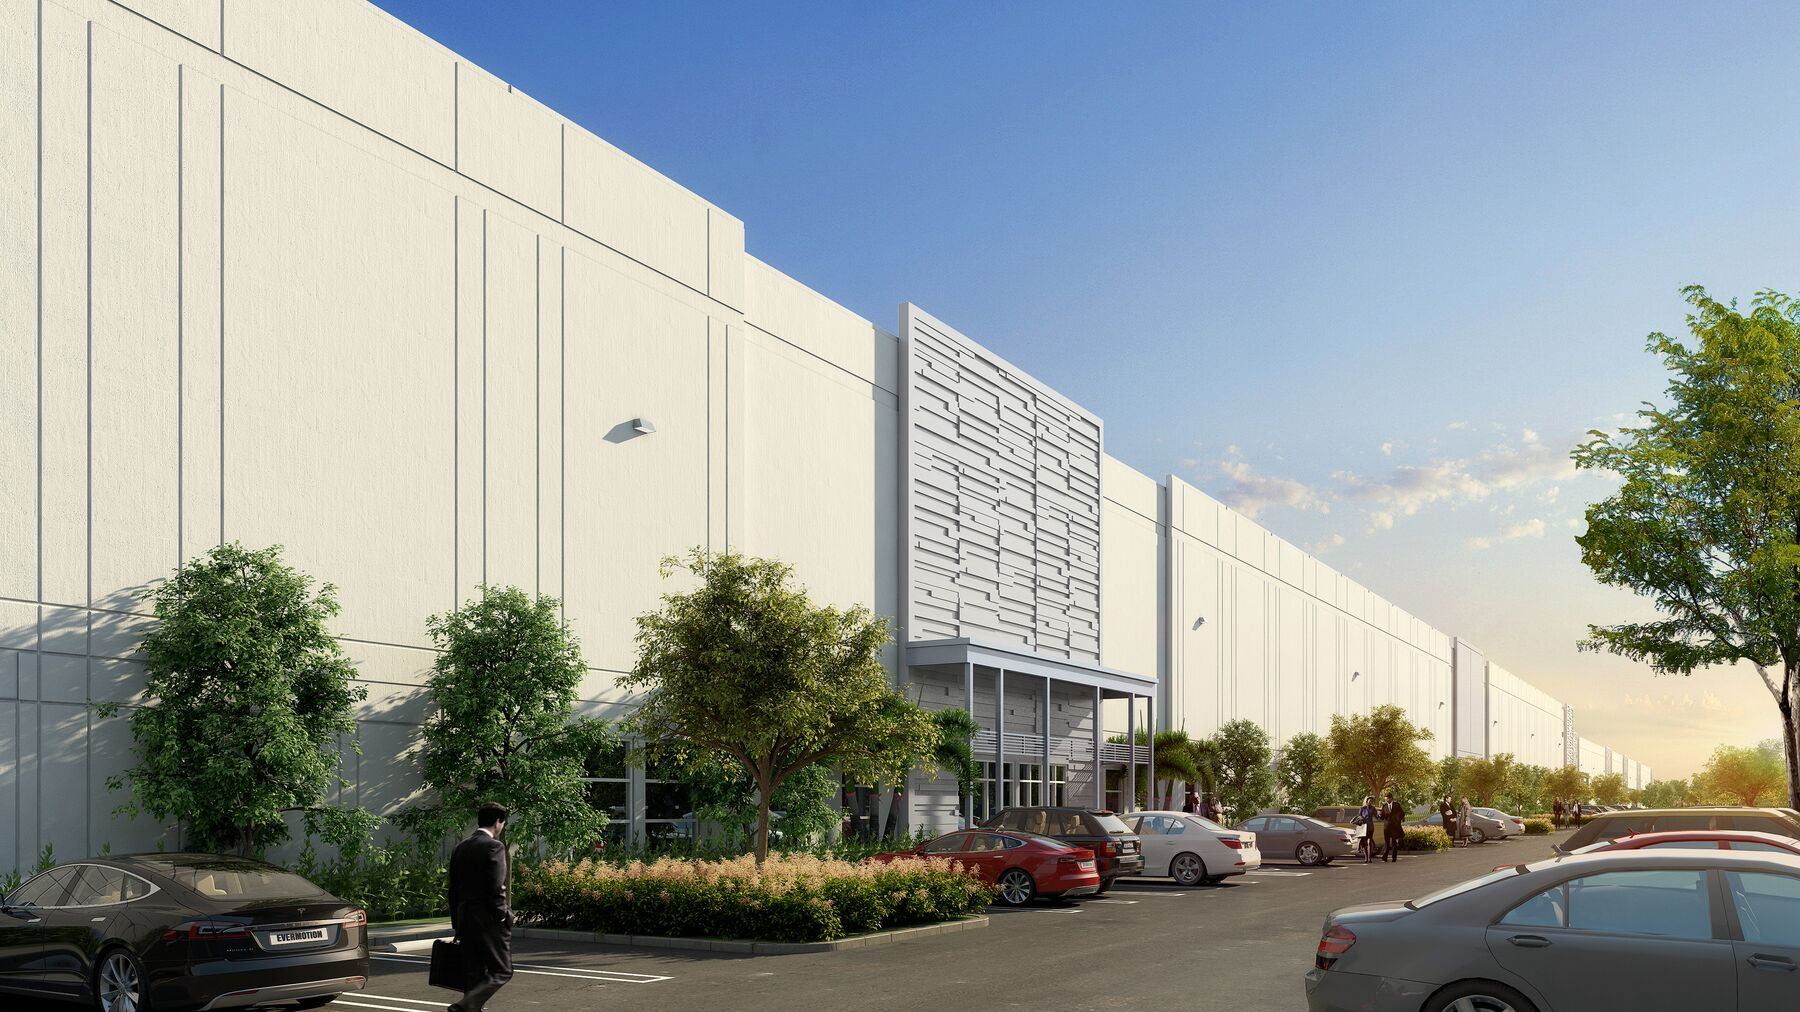 DPM-Prologis-Miami-International-Tradeport-9-Building-Rendering.jpg